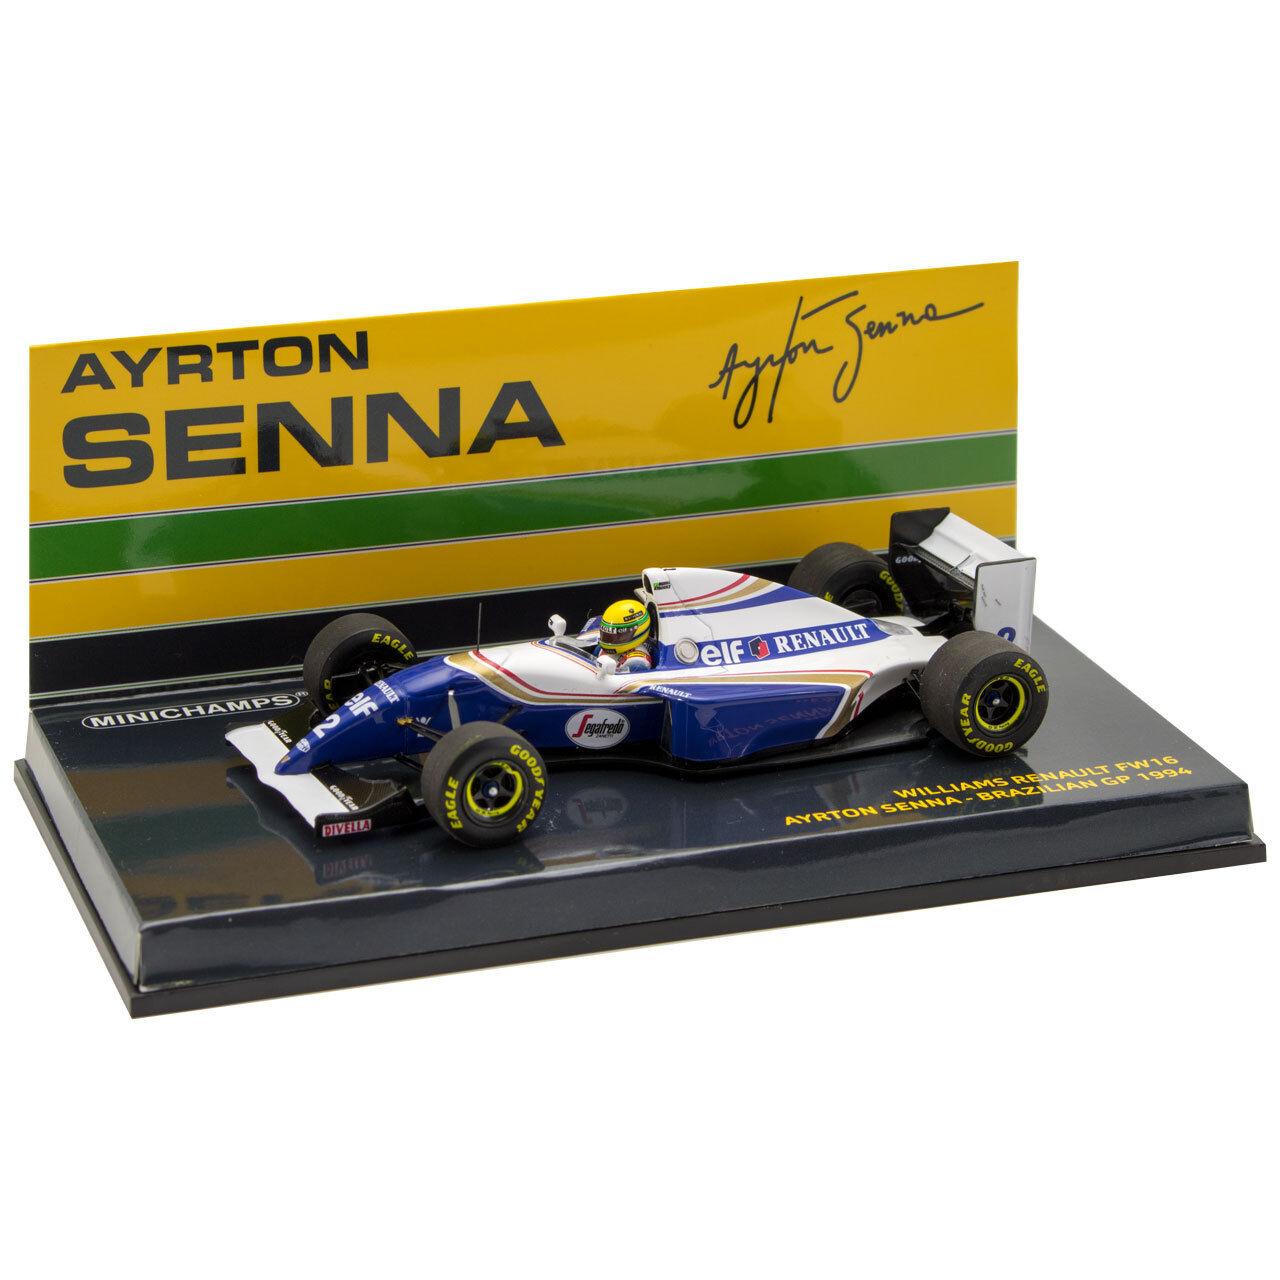 Ayrton Senna Williams Renault FW16 1994 1 43